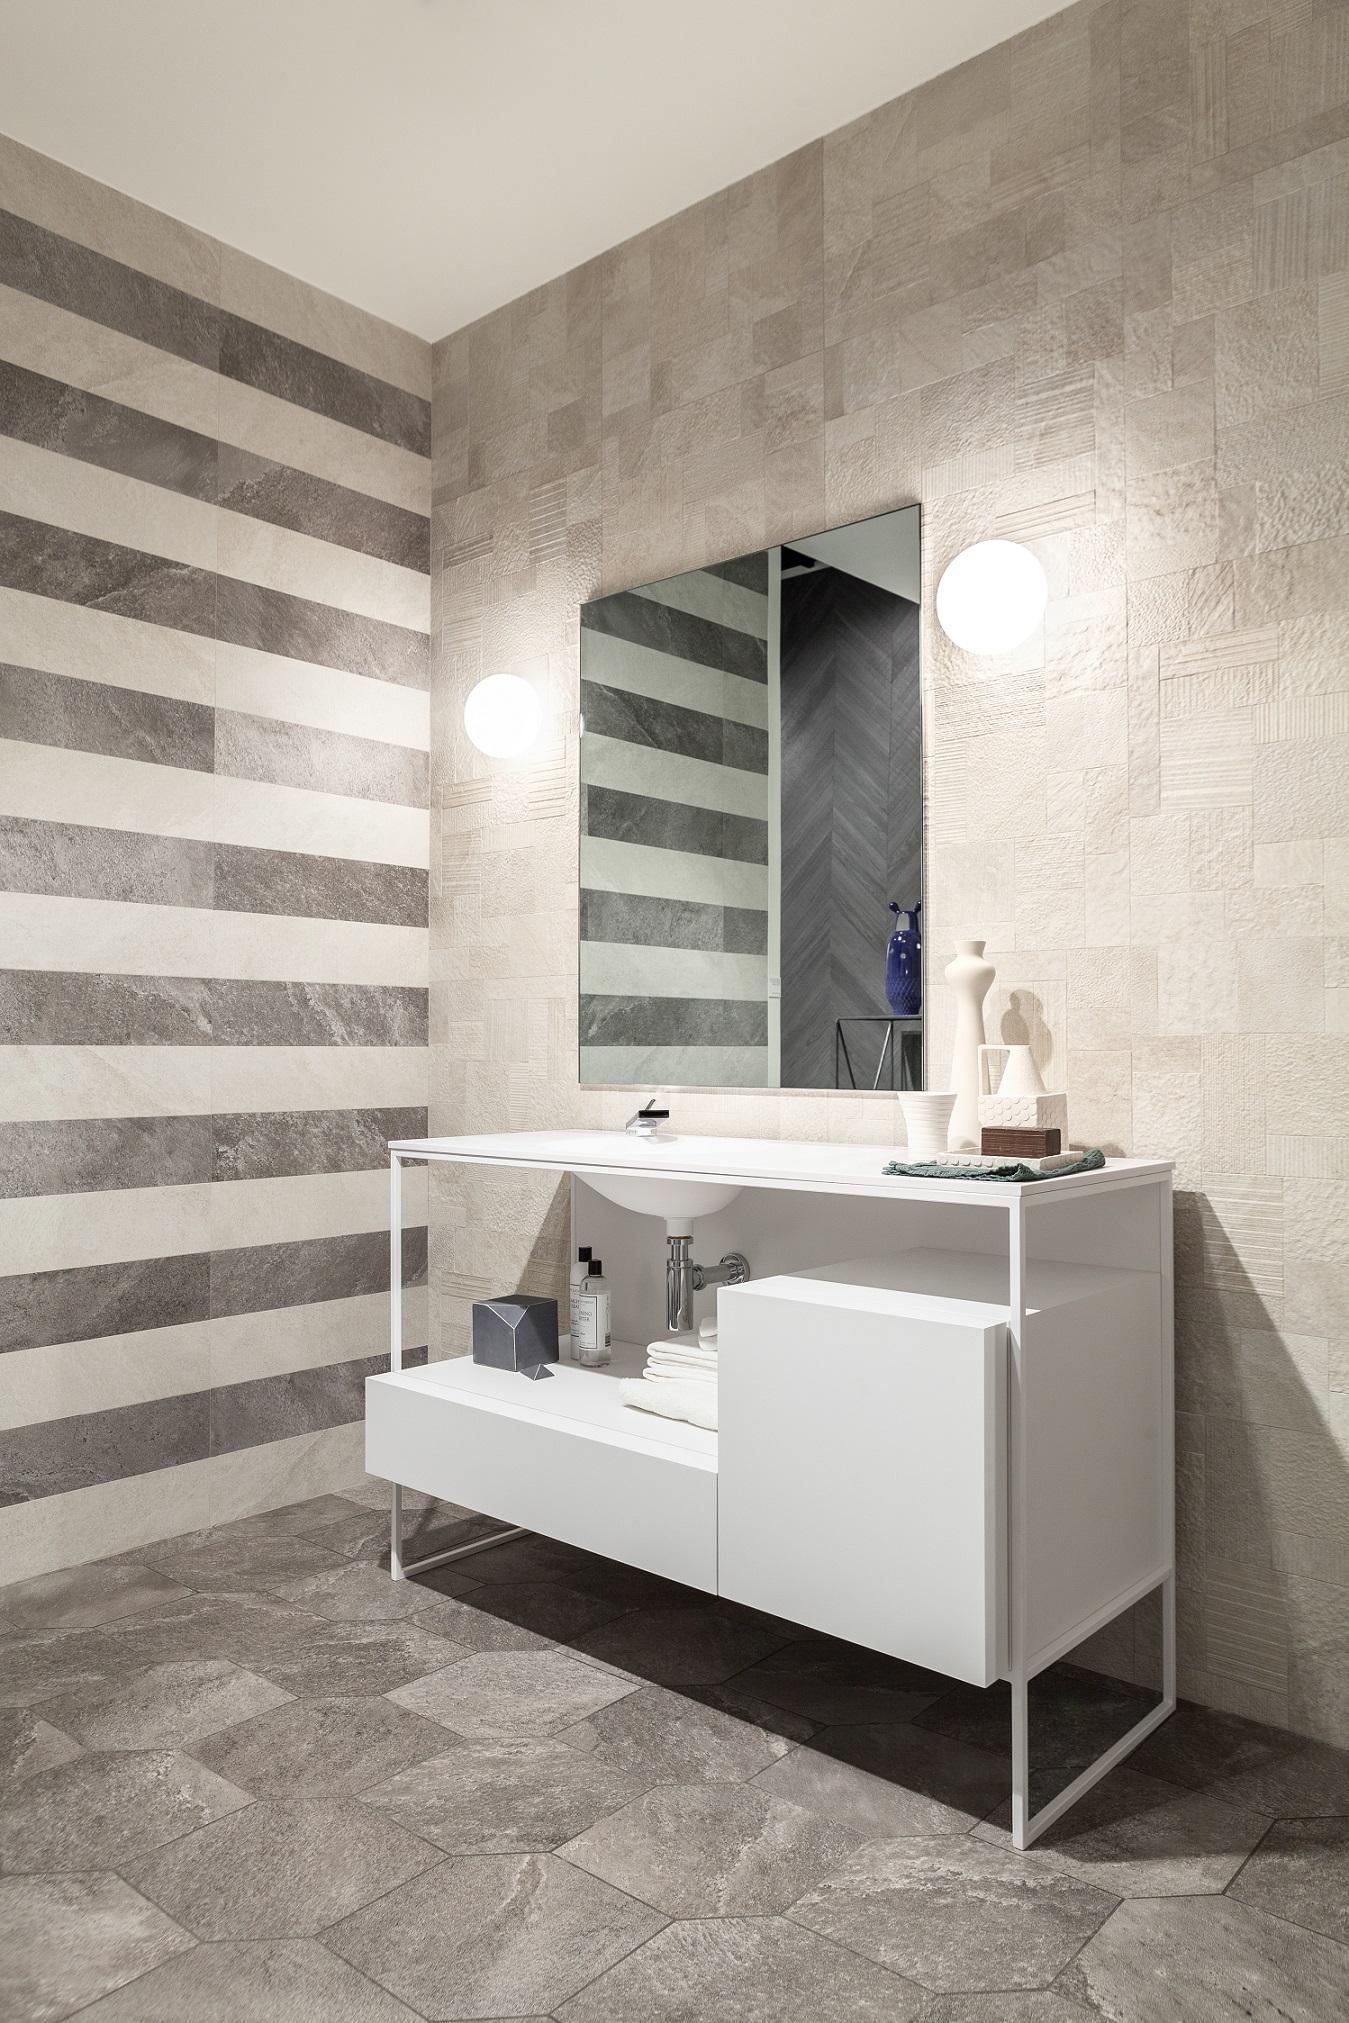 shadestone_bathroom_light grey1560 nat-mix light6060 nat-code stone grey nat